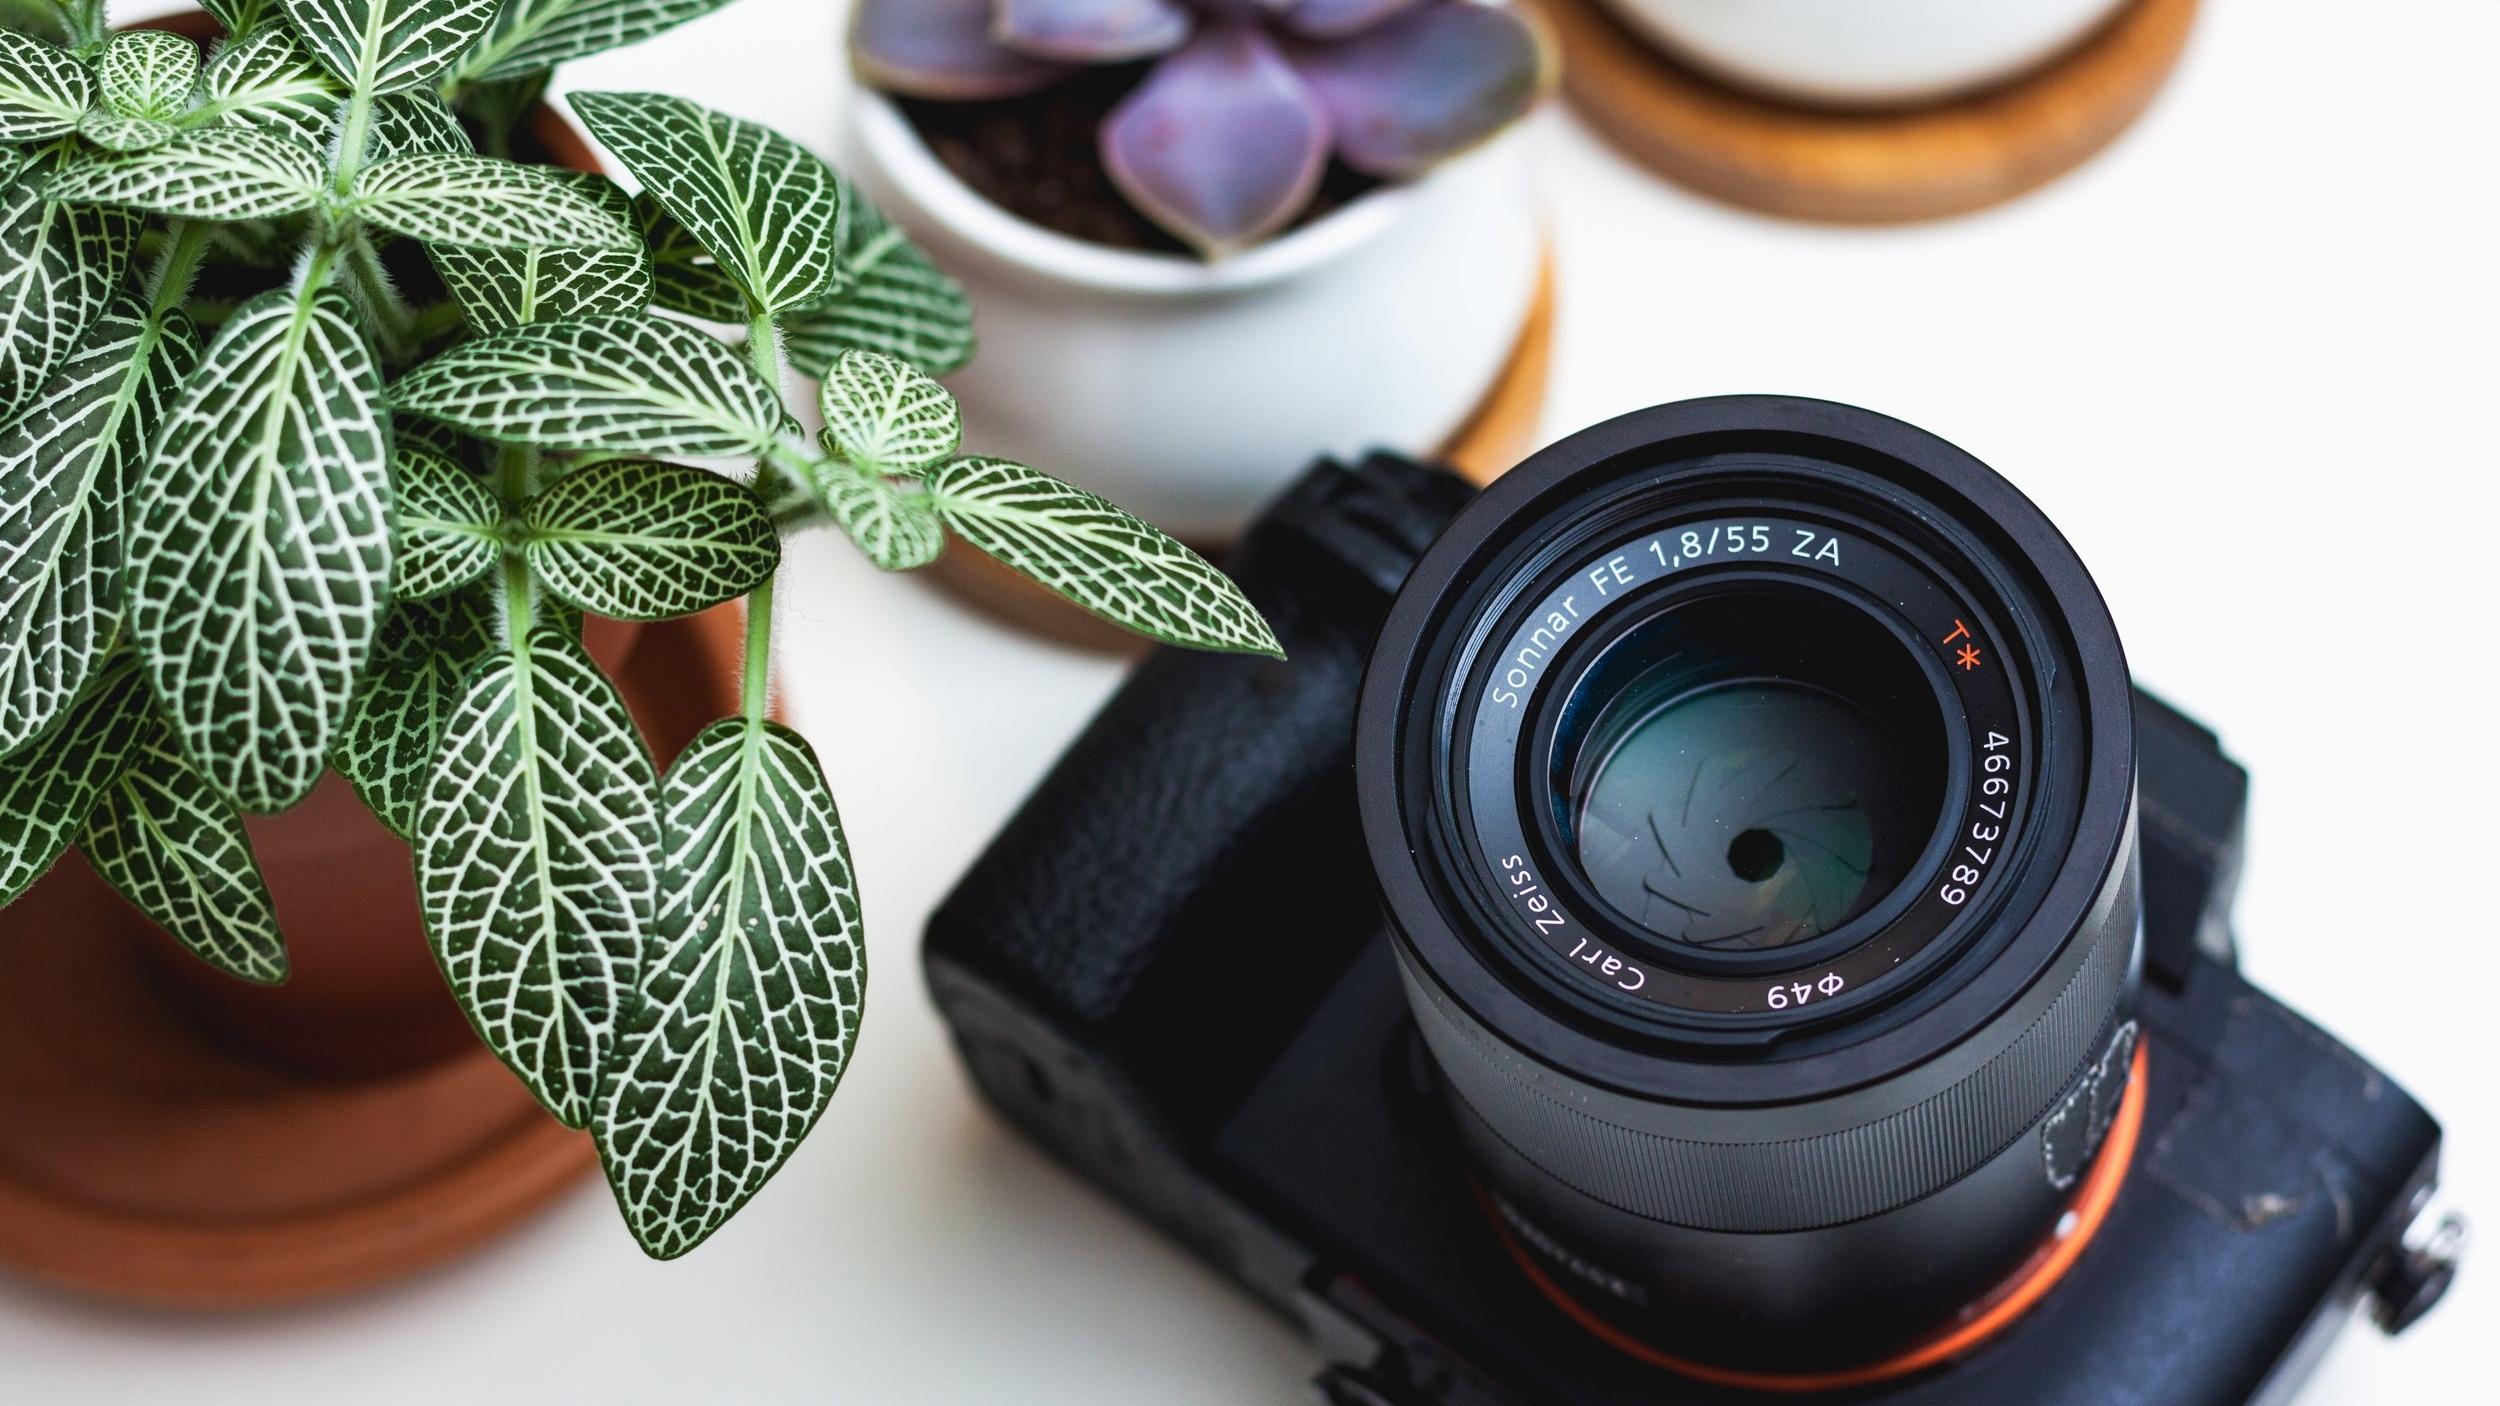 metering mode in your camera